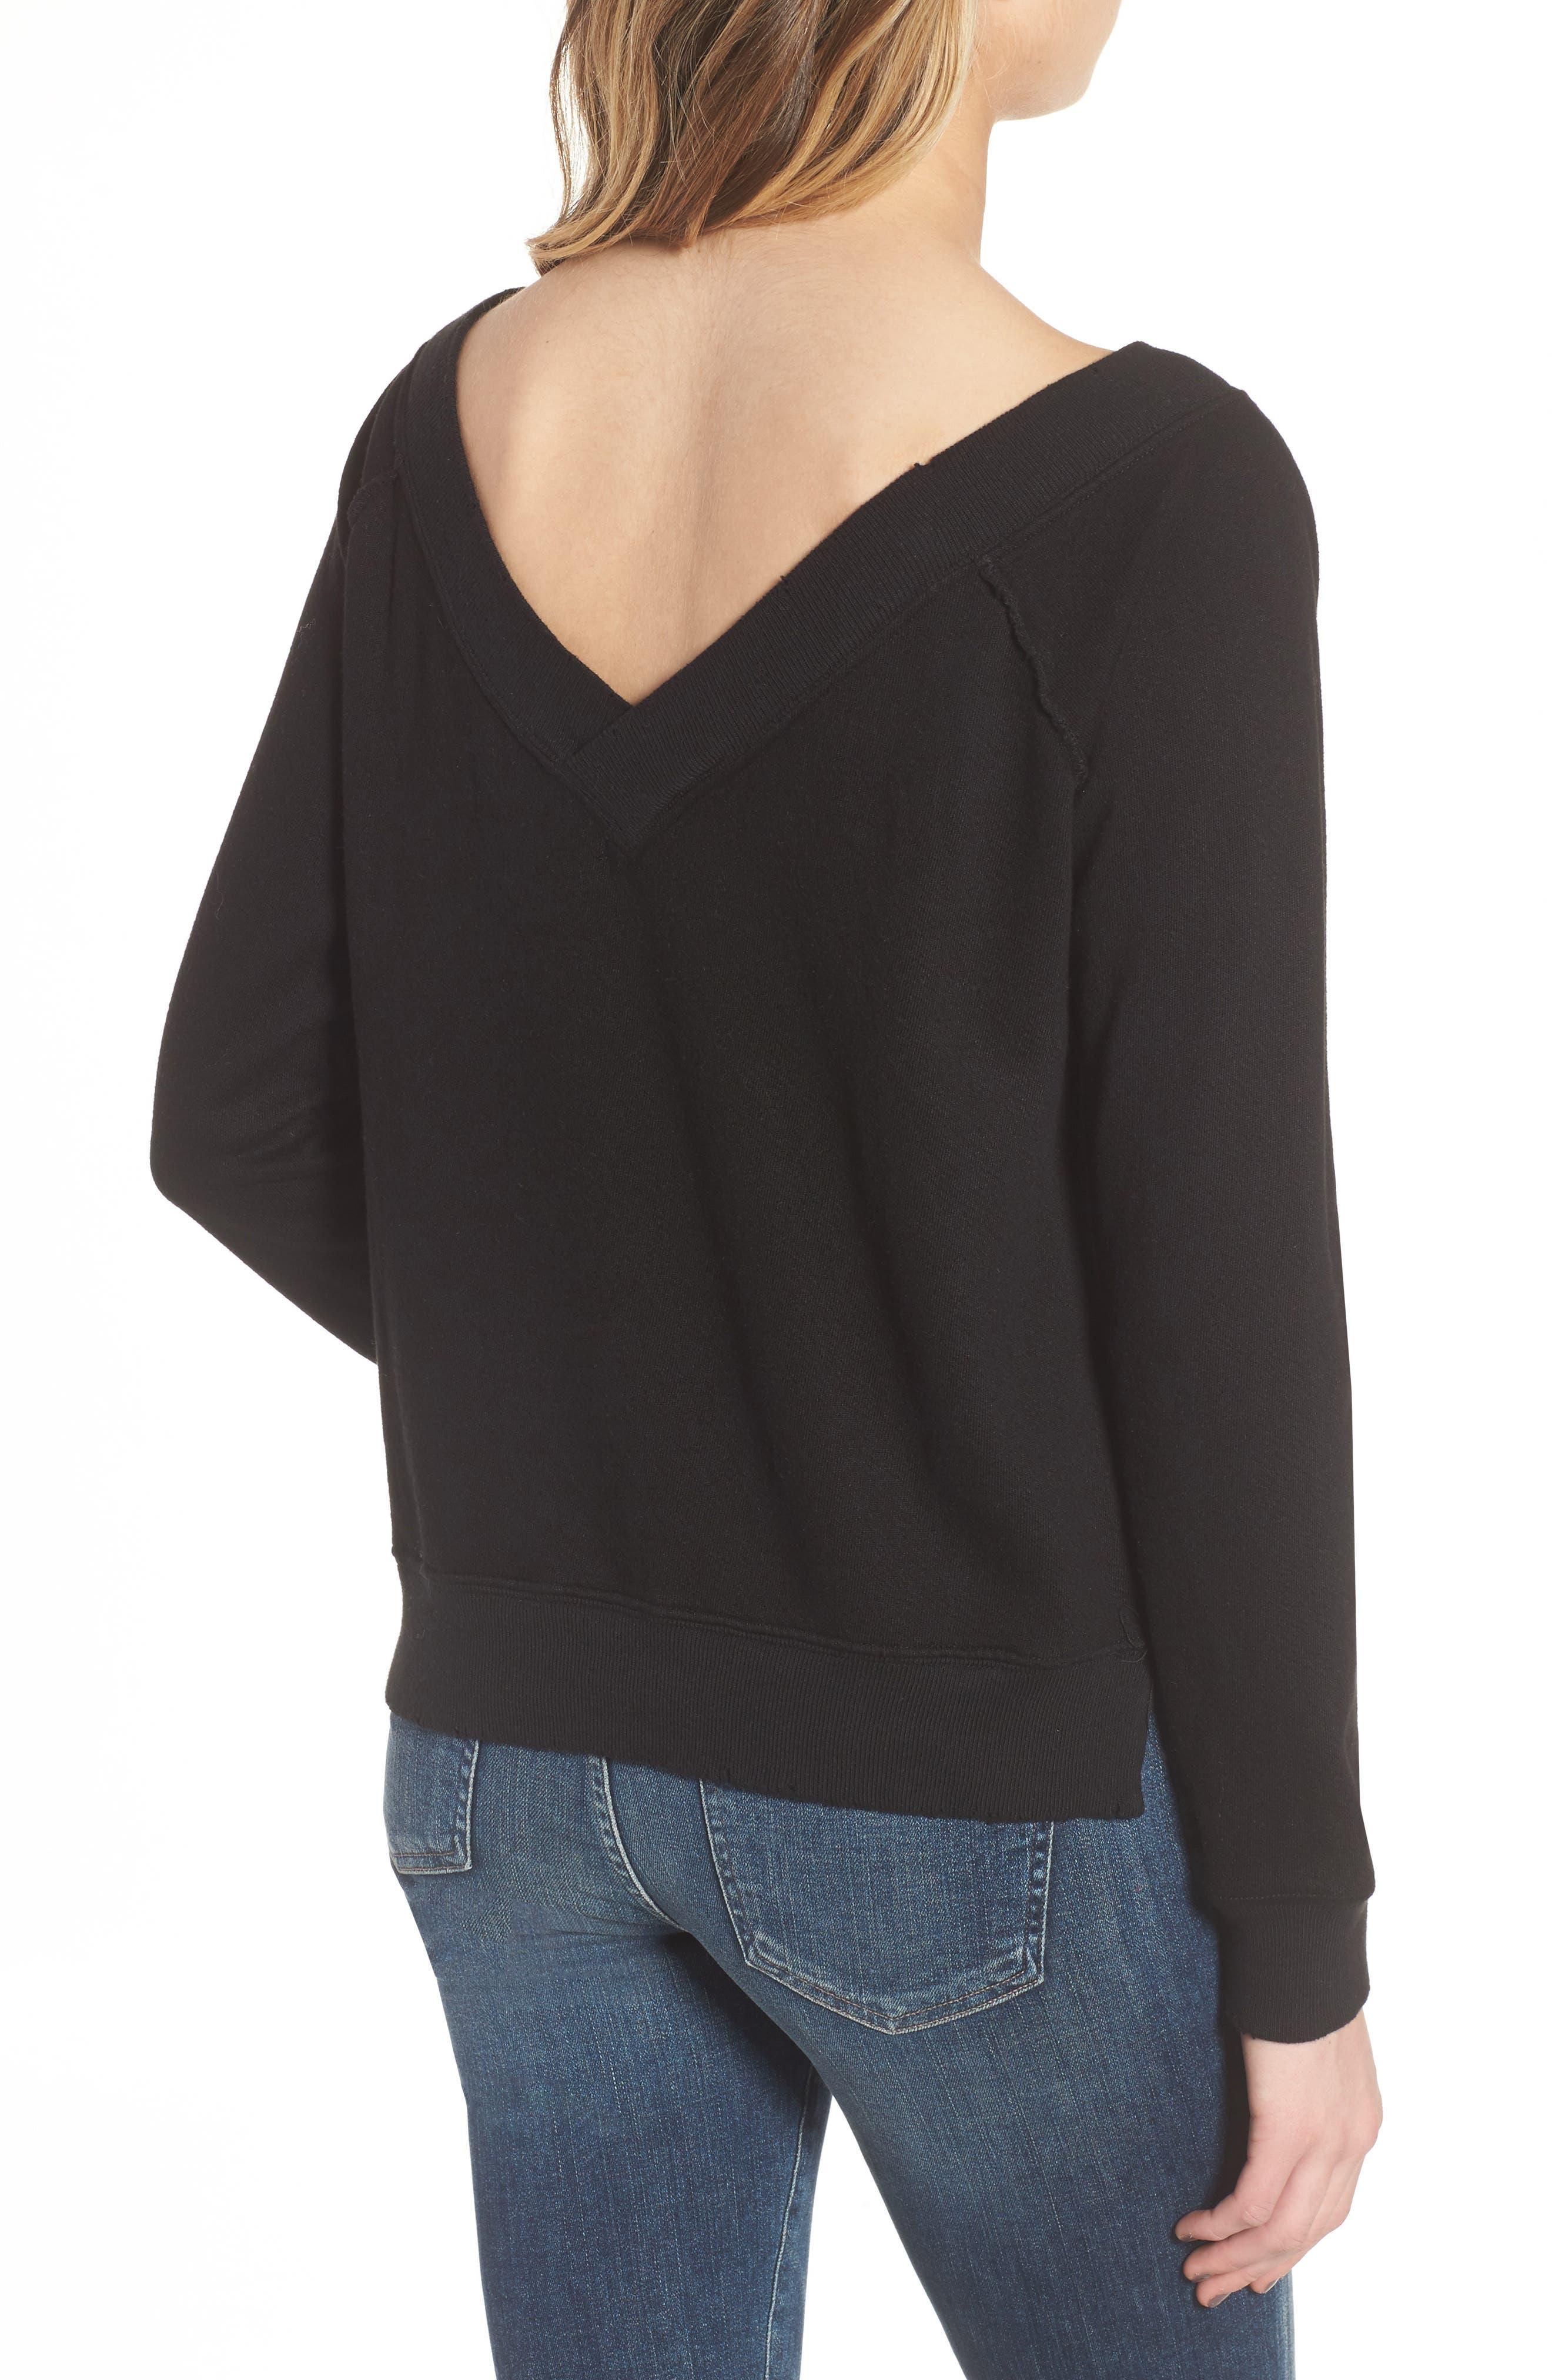 Mayer V-Neck Sweatshirt,                             Alternate thumbnail 2, color,                             002